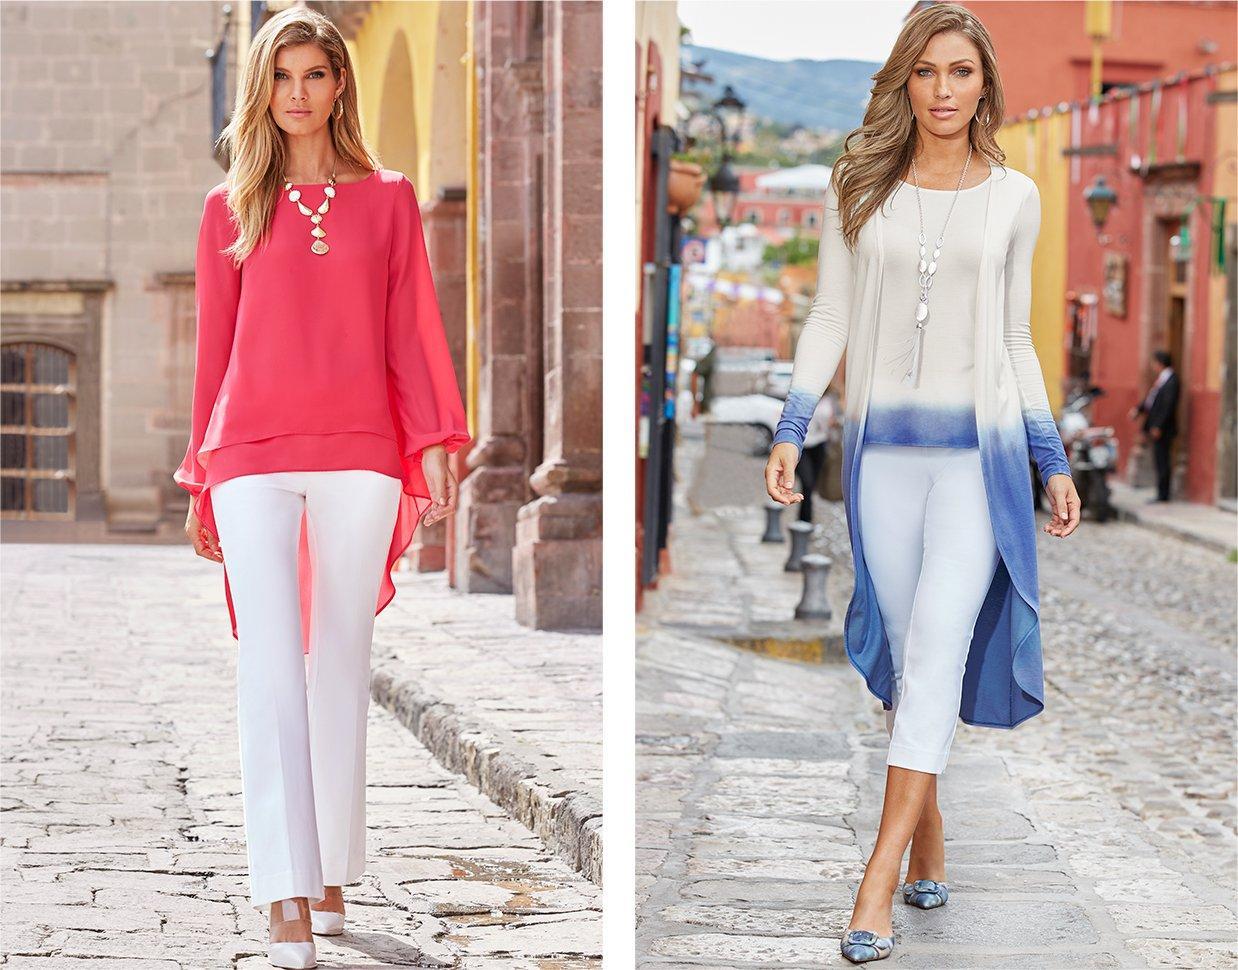 left model wearing a pink hi-lo long sleeve top, white crop bootcut pants, and white vinyl heels. right model wearing a blue and white ombre duster and top combo, white crop pants, and blue tie-dye mules.